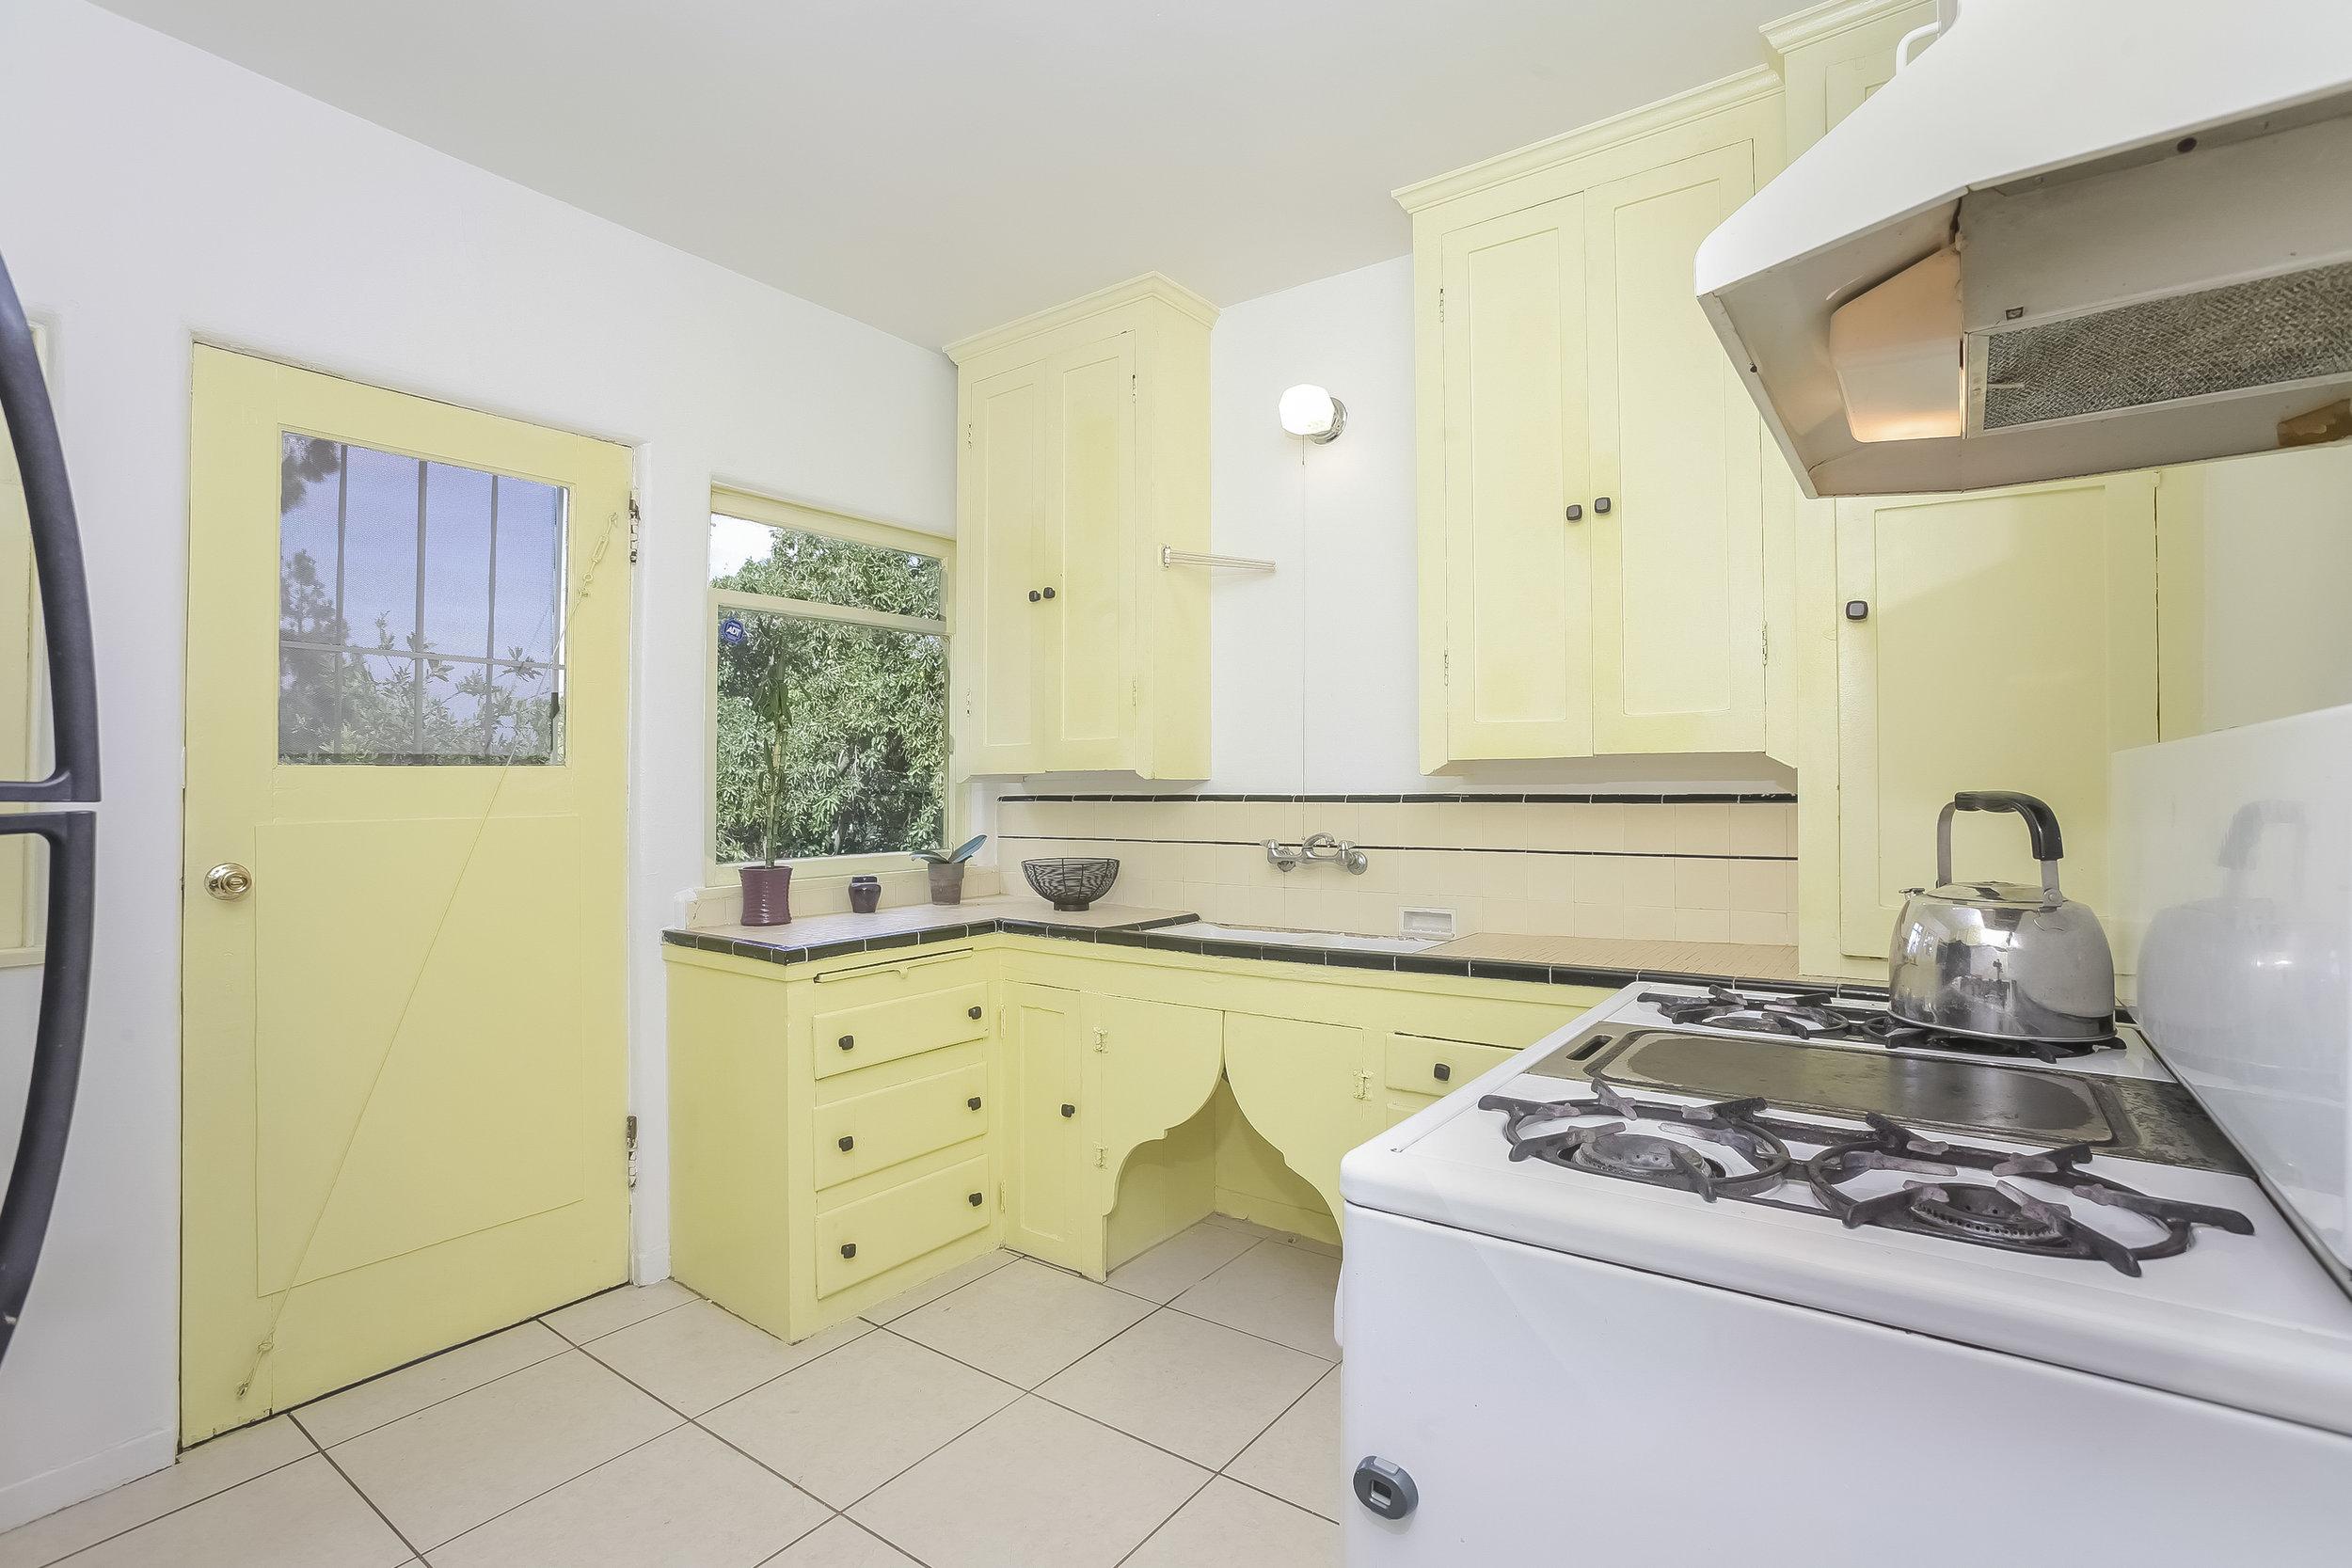 012-Kitchen-4517241-large.jpg